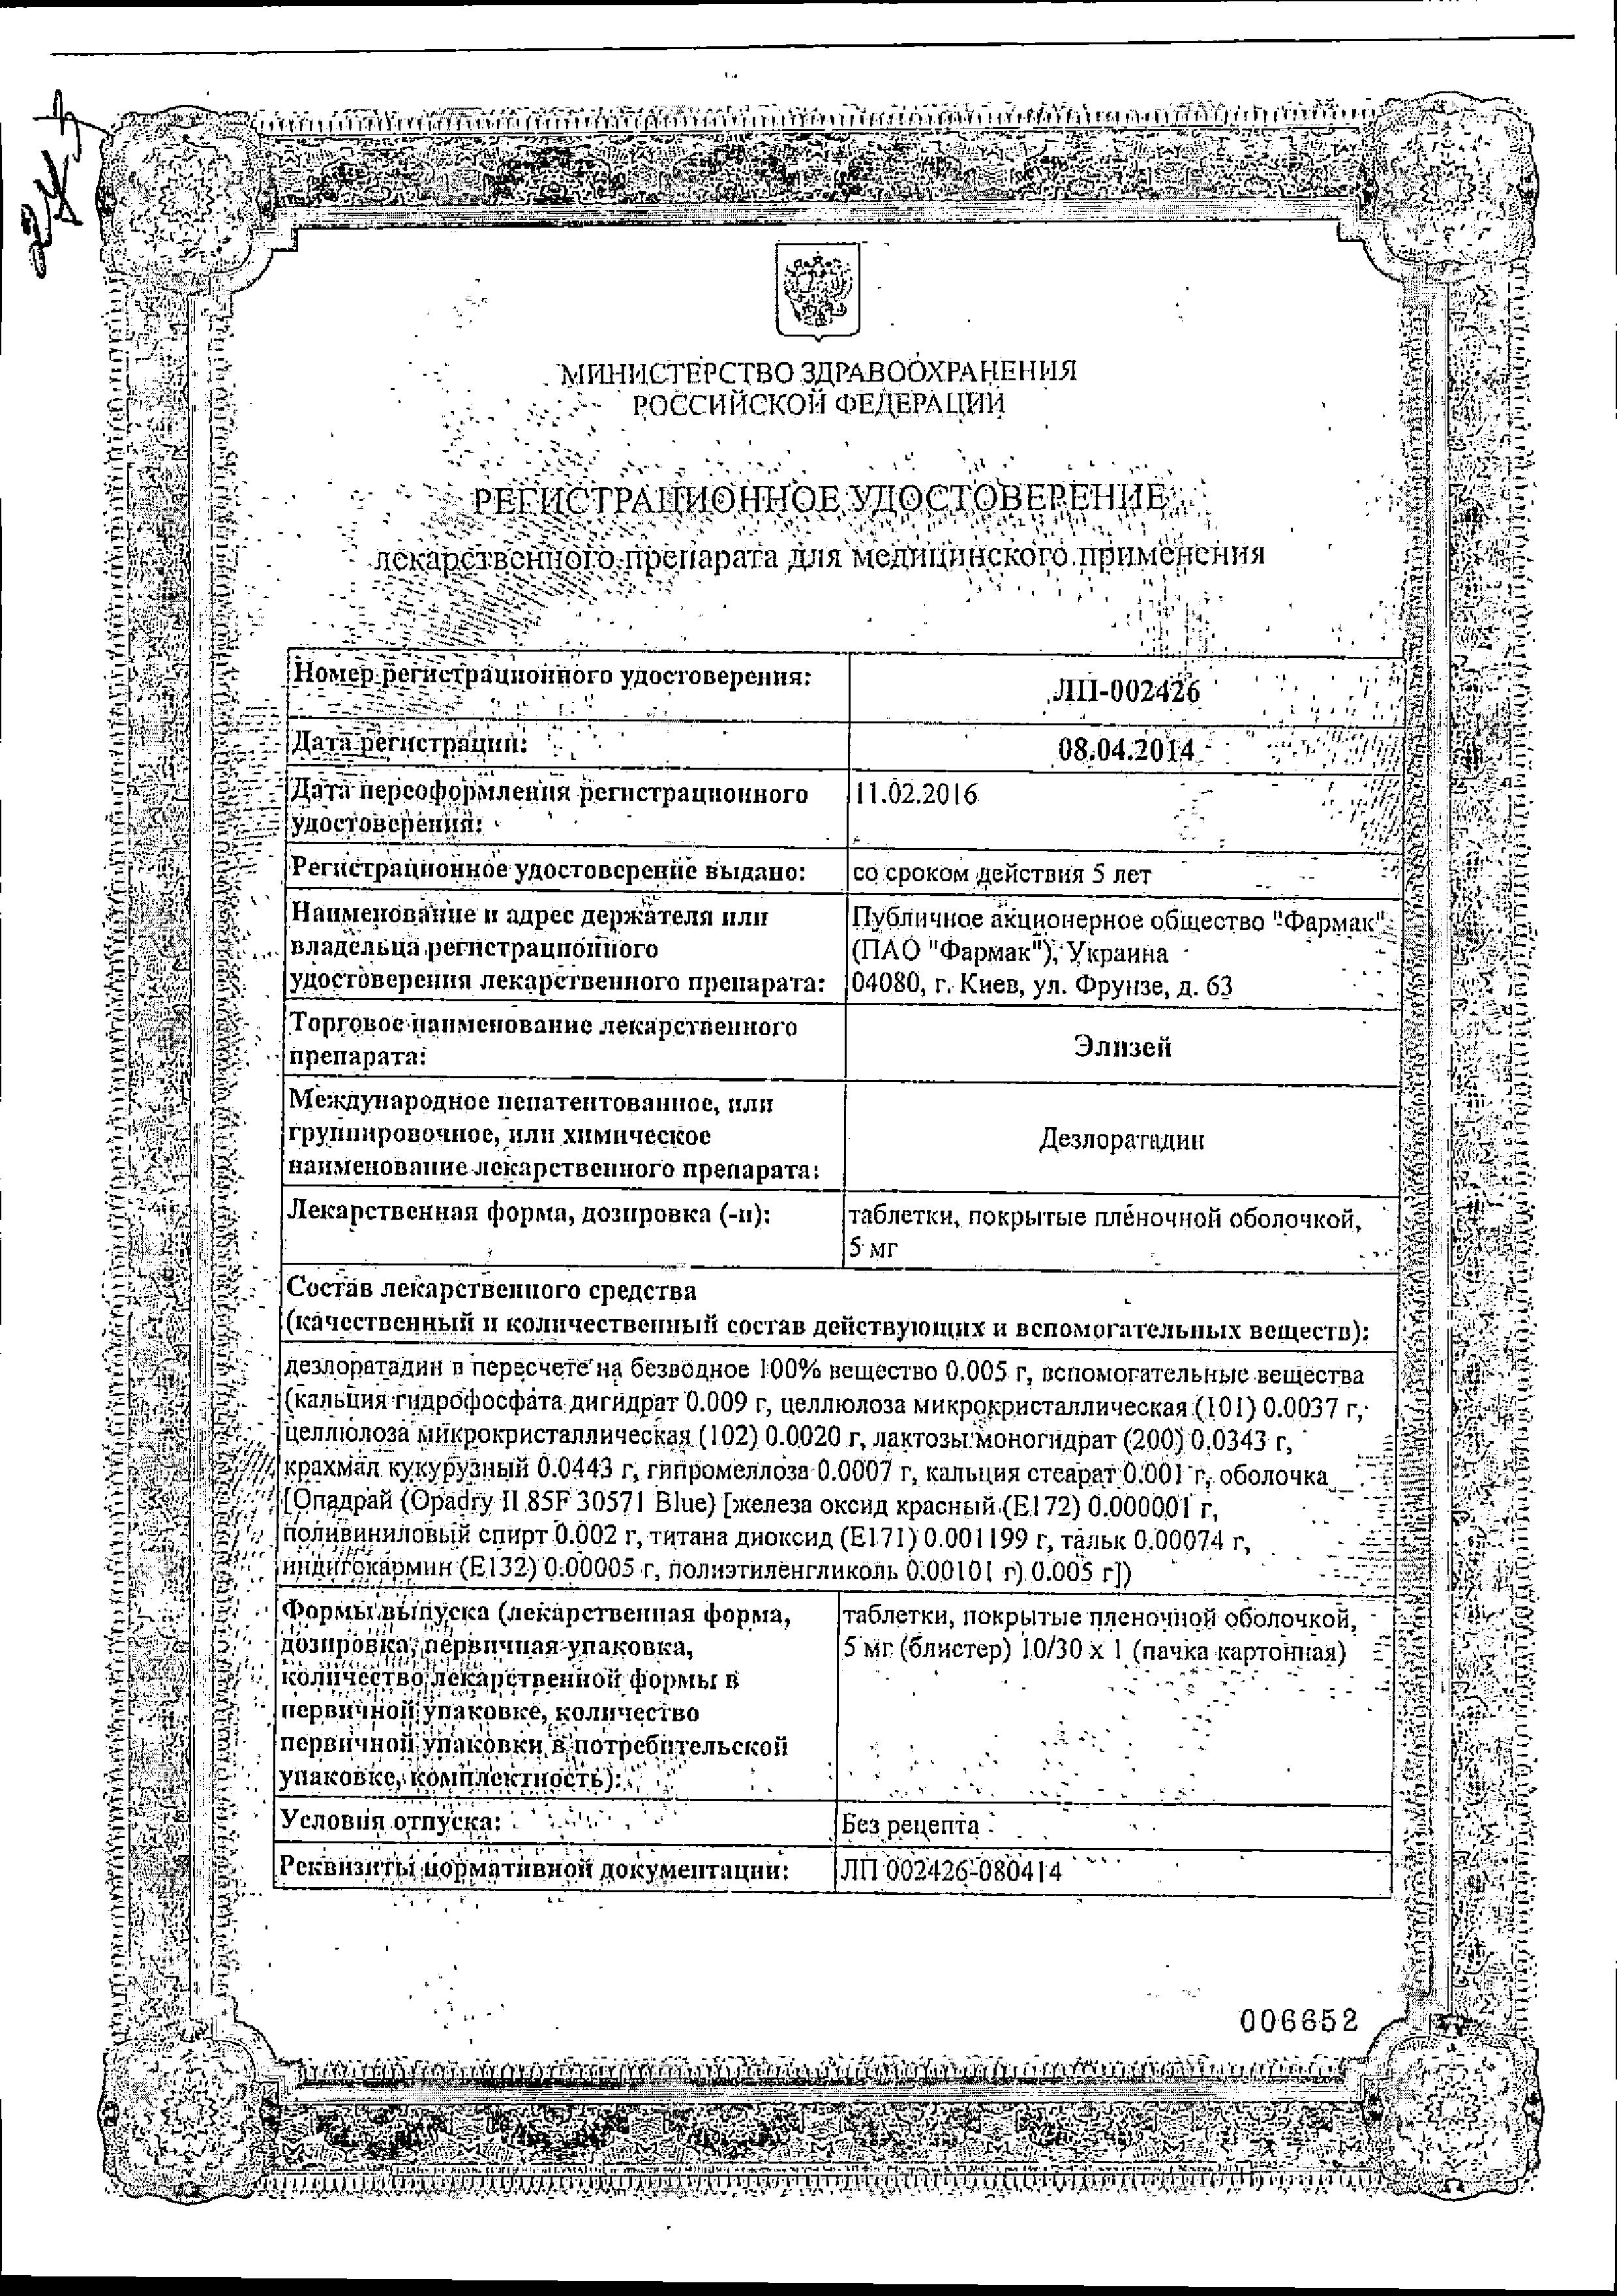 Элизей сертификат